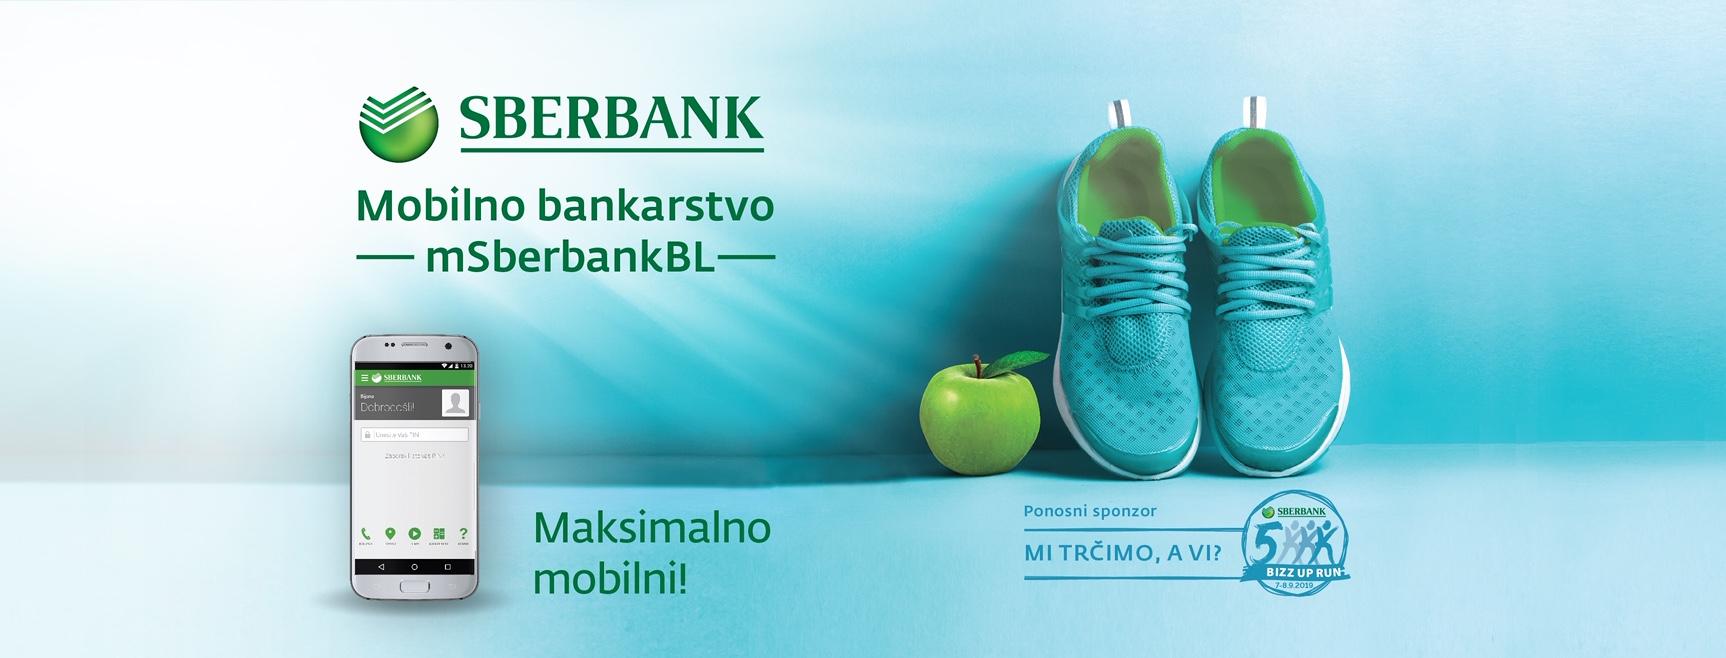 "Sberbank Banja Luka ponosni sponzor timske trke ""Sberbank 5K BIZZ UP Run"""